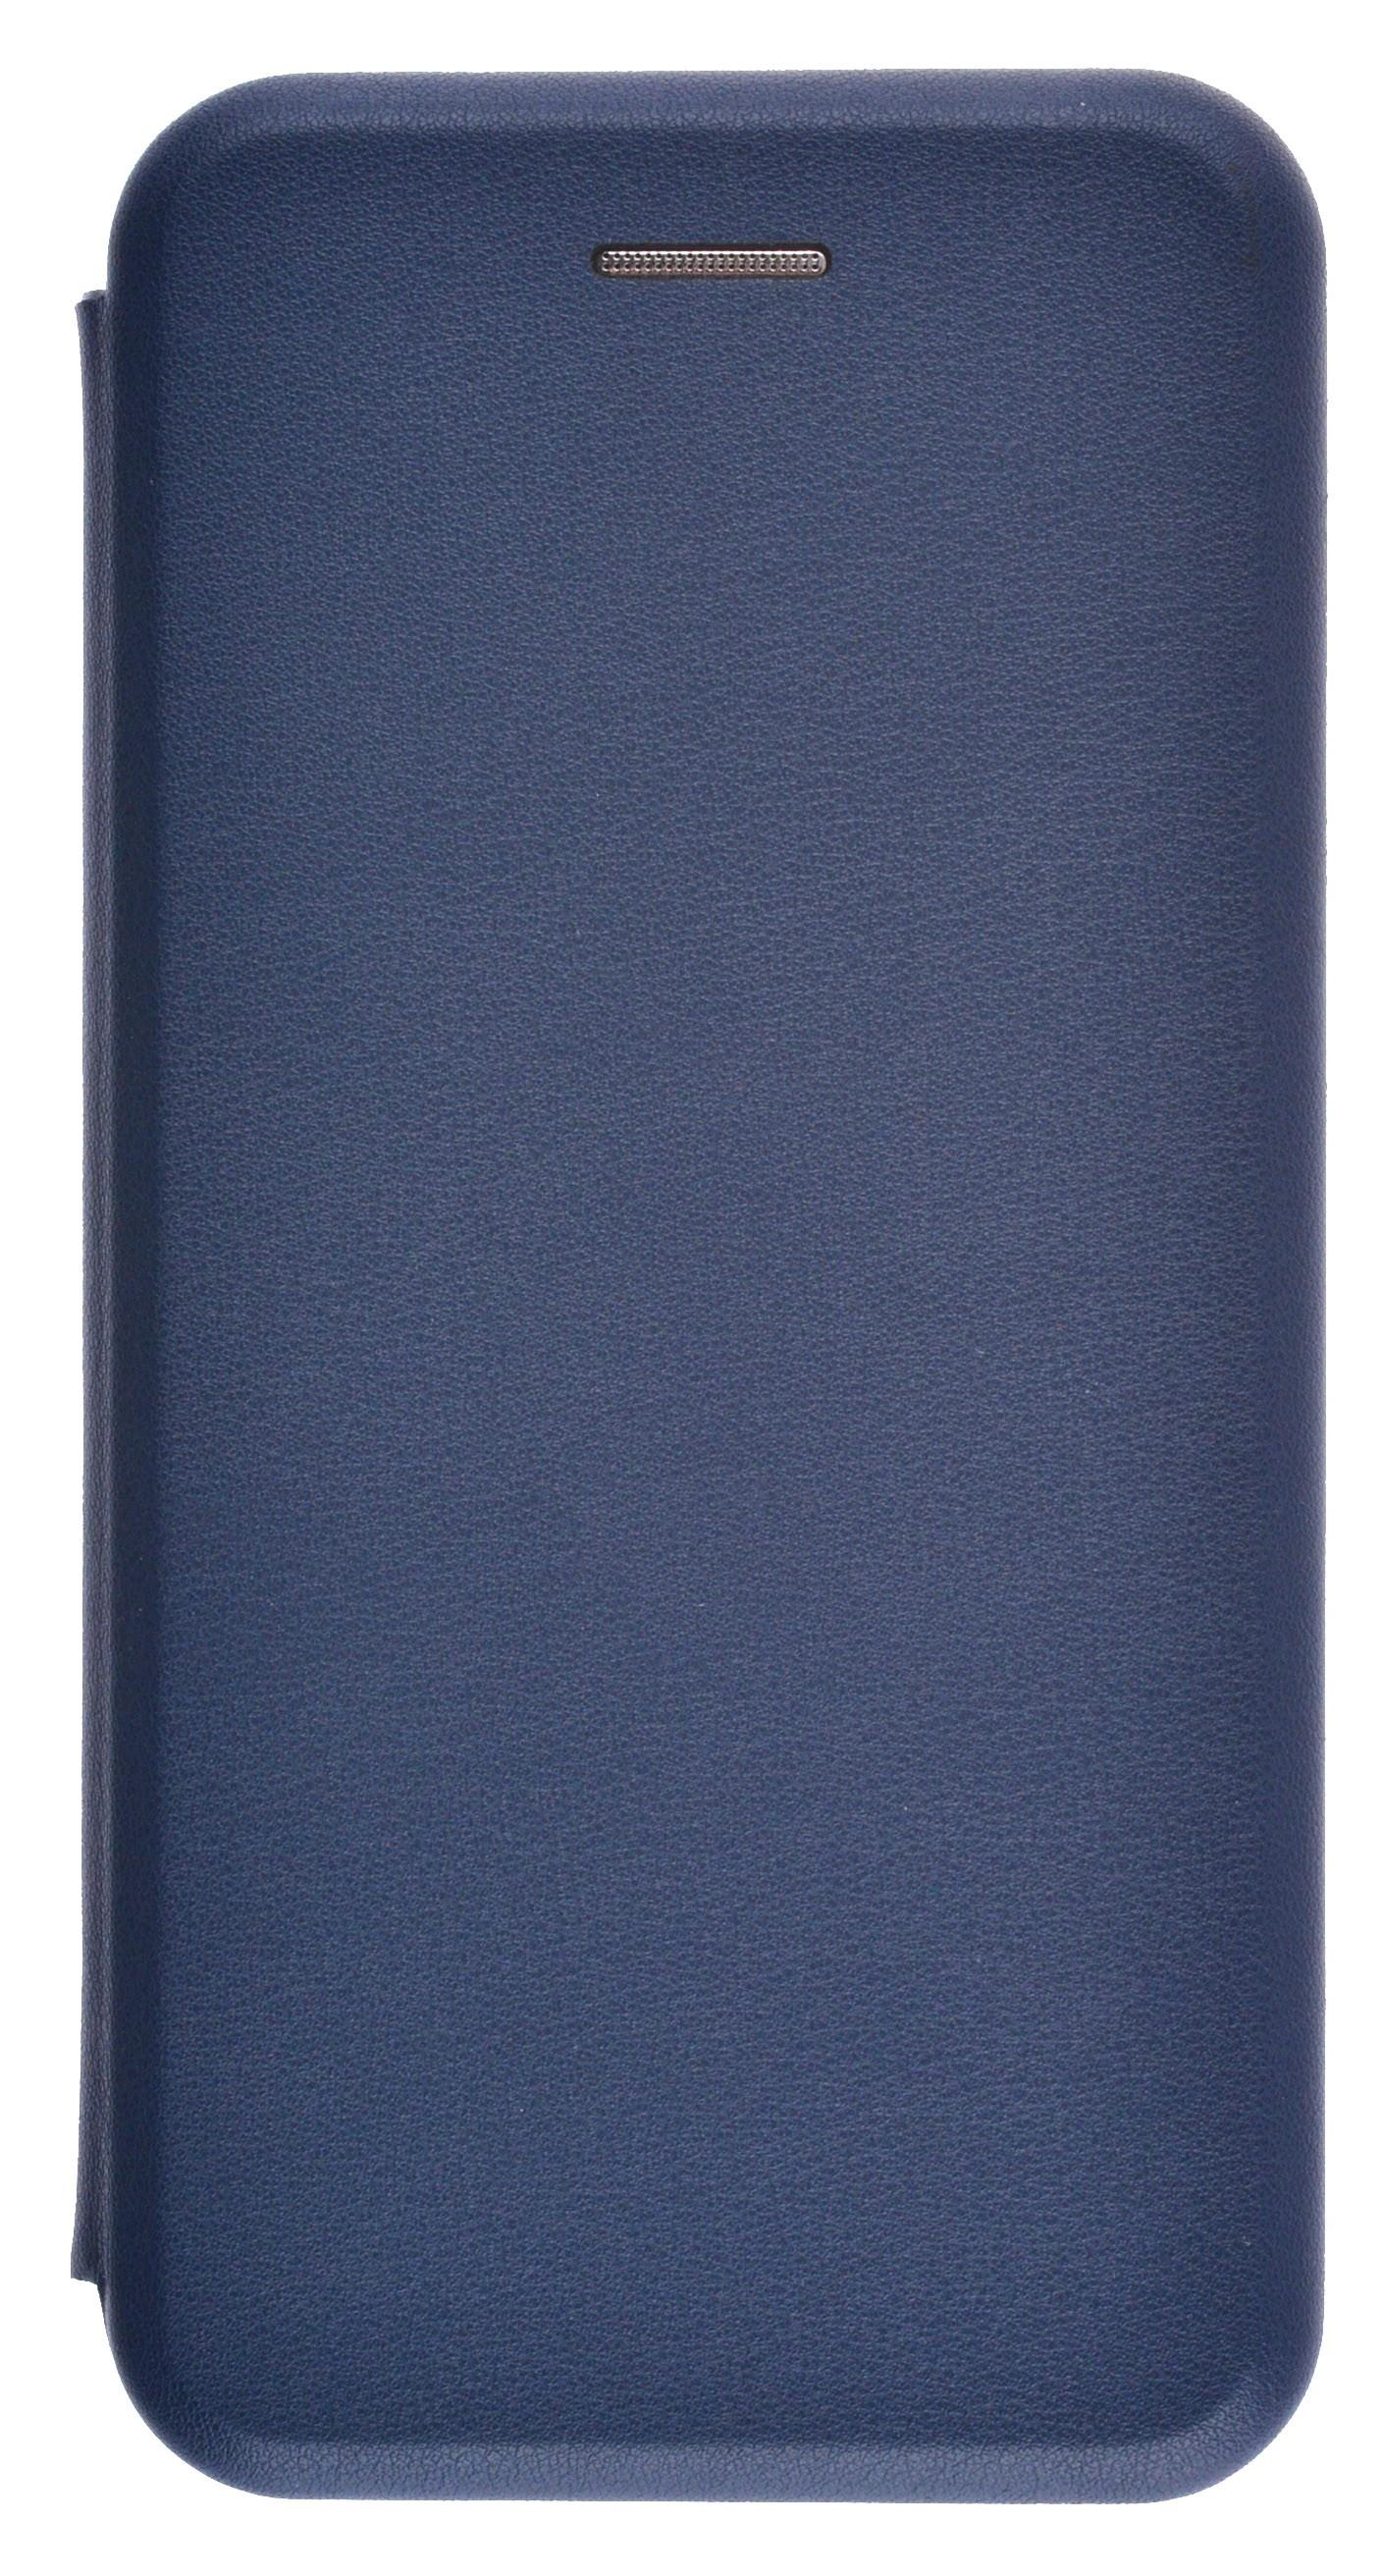 Чехол для сотового телефона skinBOX Screens, 4660041408324, синий цена и фото